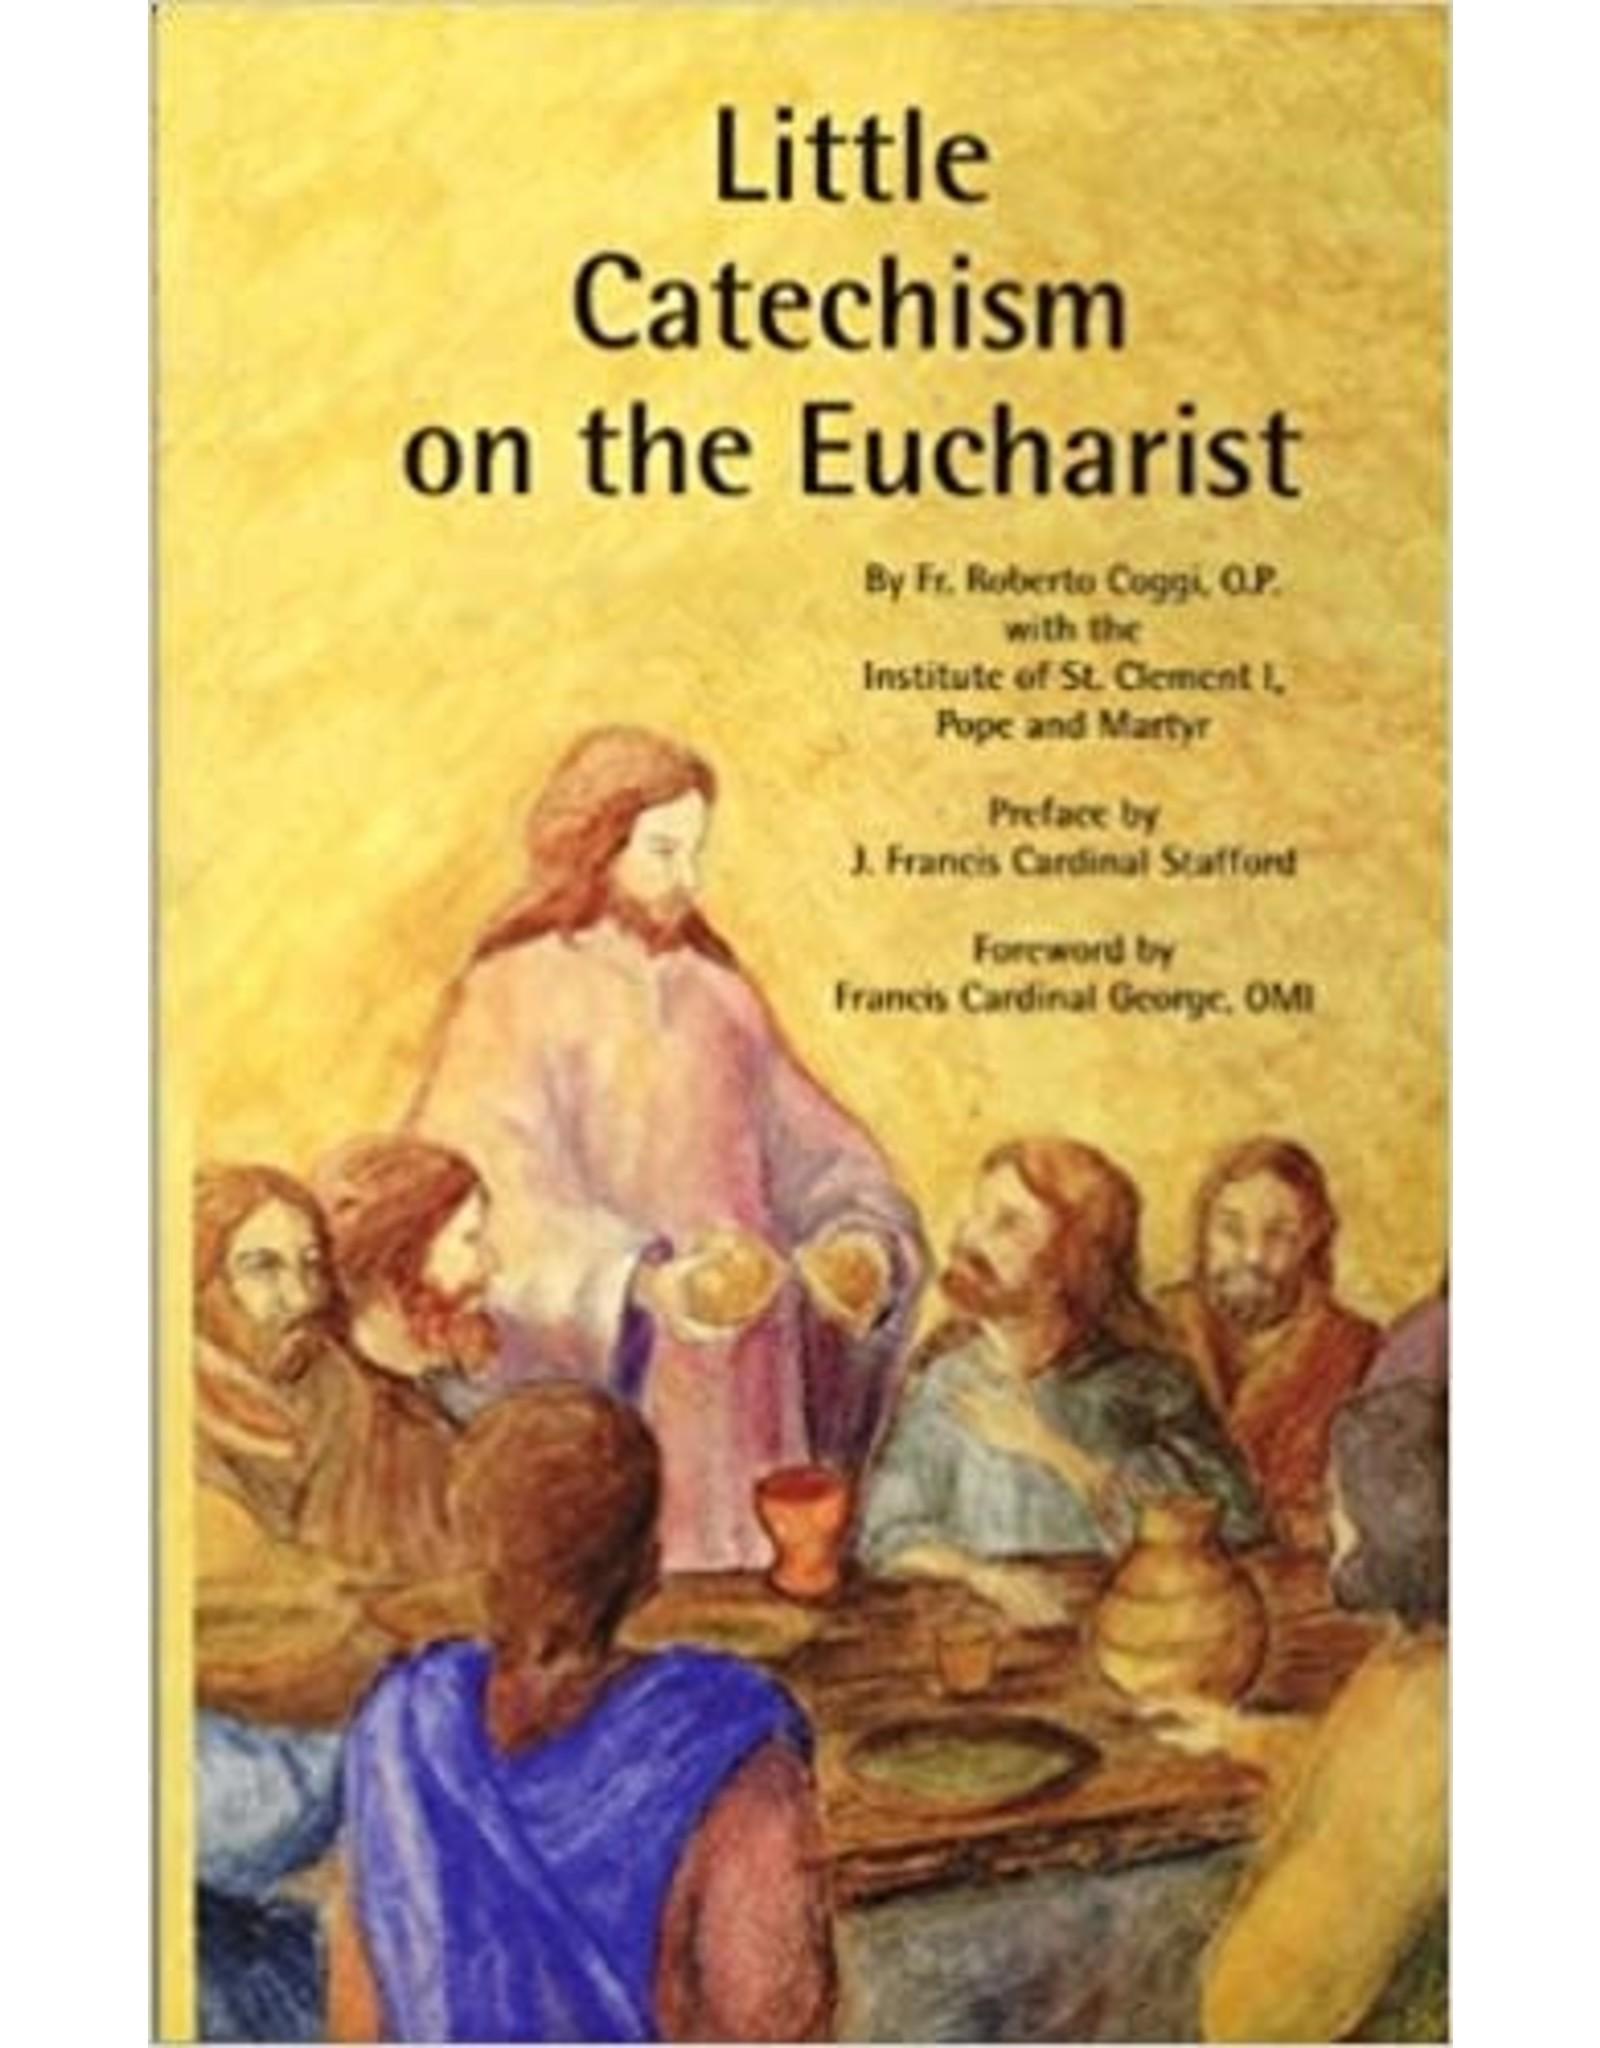 Little Catechism on the Eucharist, Fr Roberto Coggi, O.P.